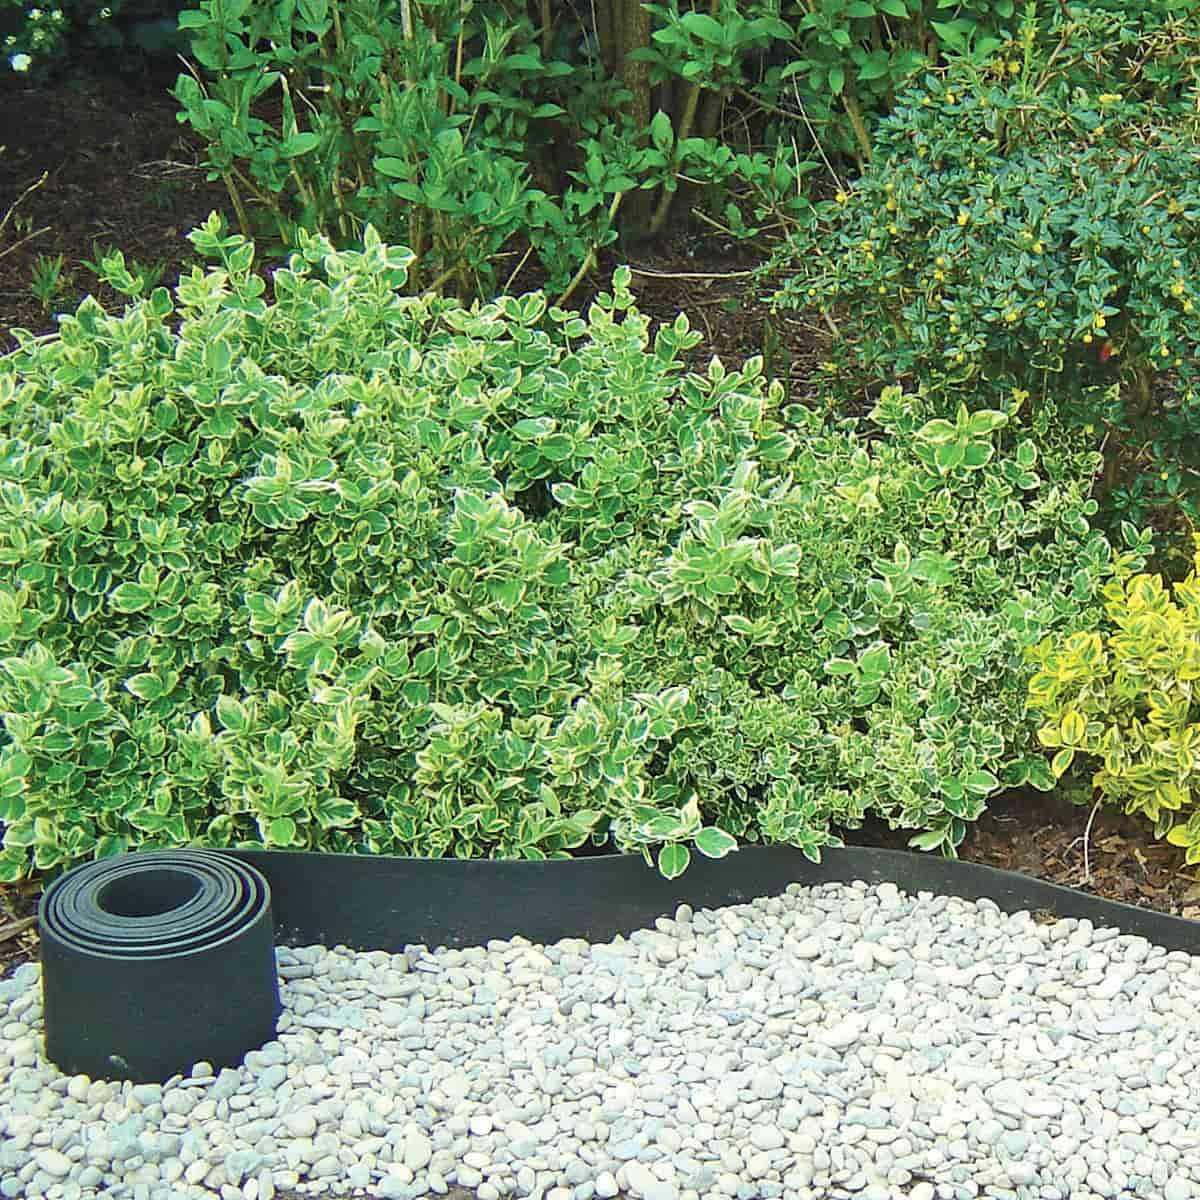 Bordure Caoutchouc Recyclé Gazon 5Mx13Cm serapportantà Bordure De Jardin Special Tondeuse